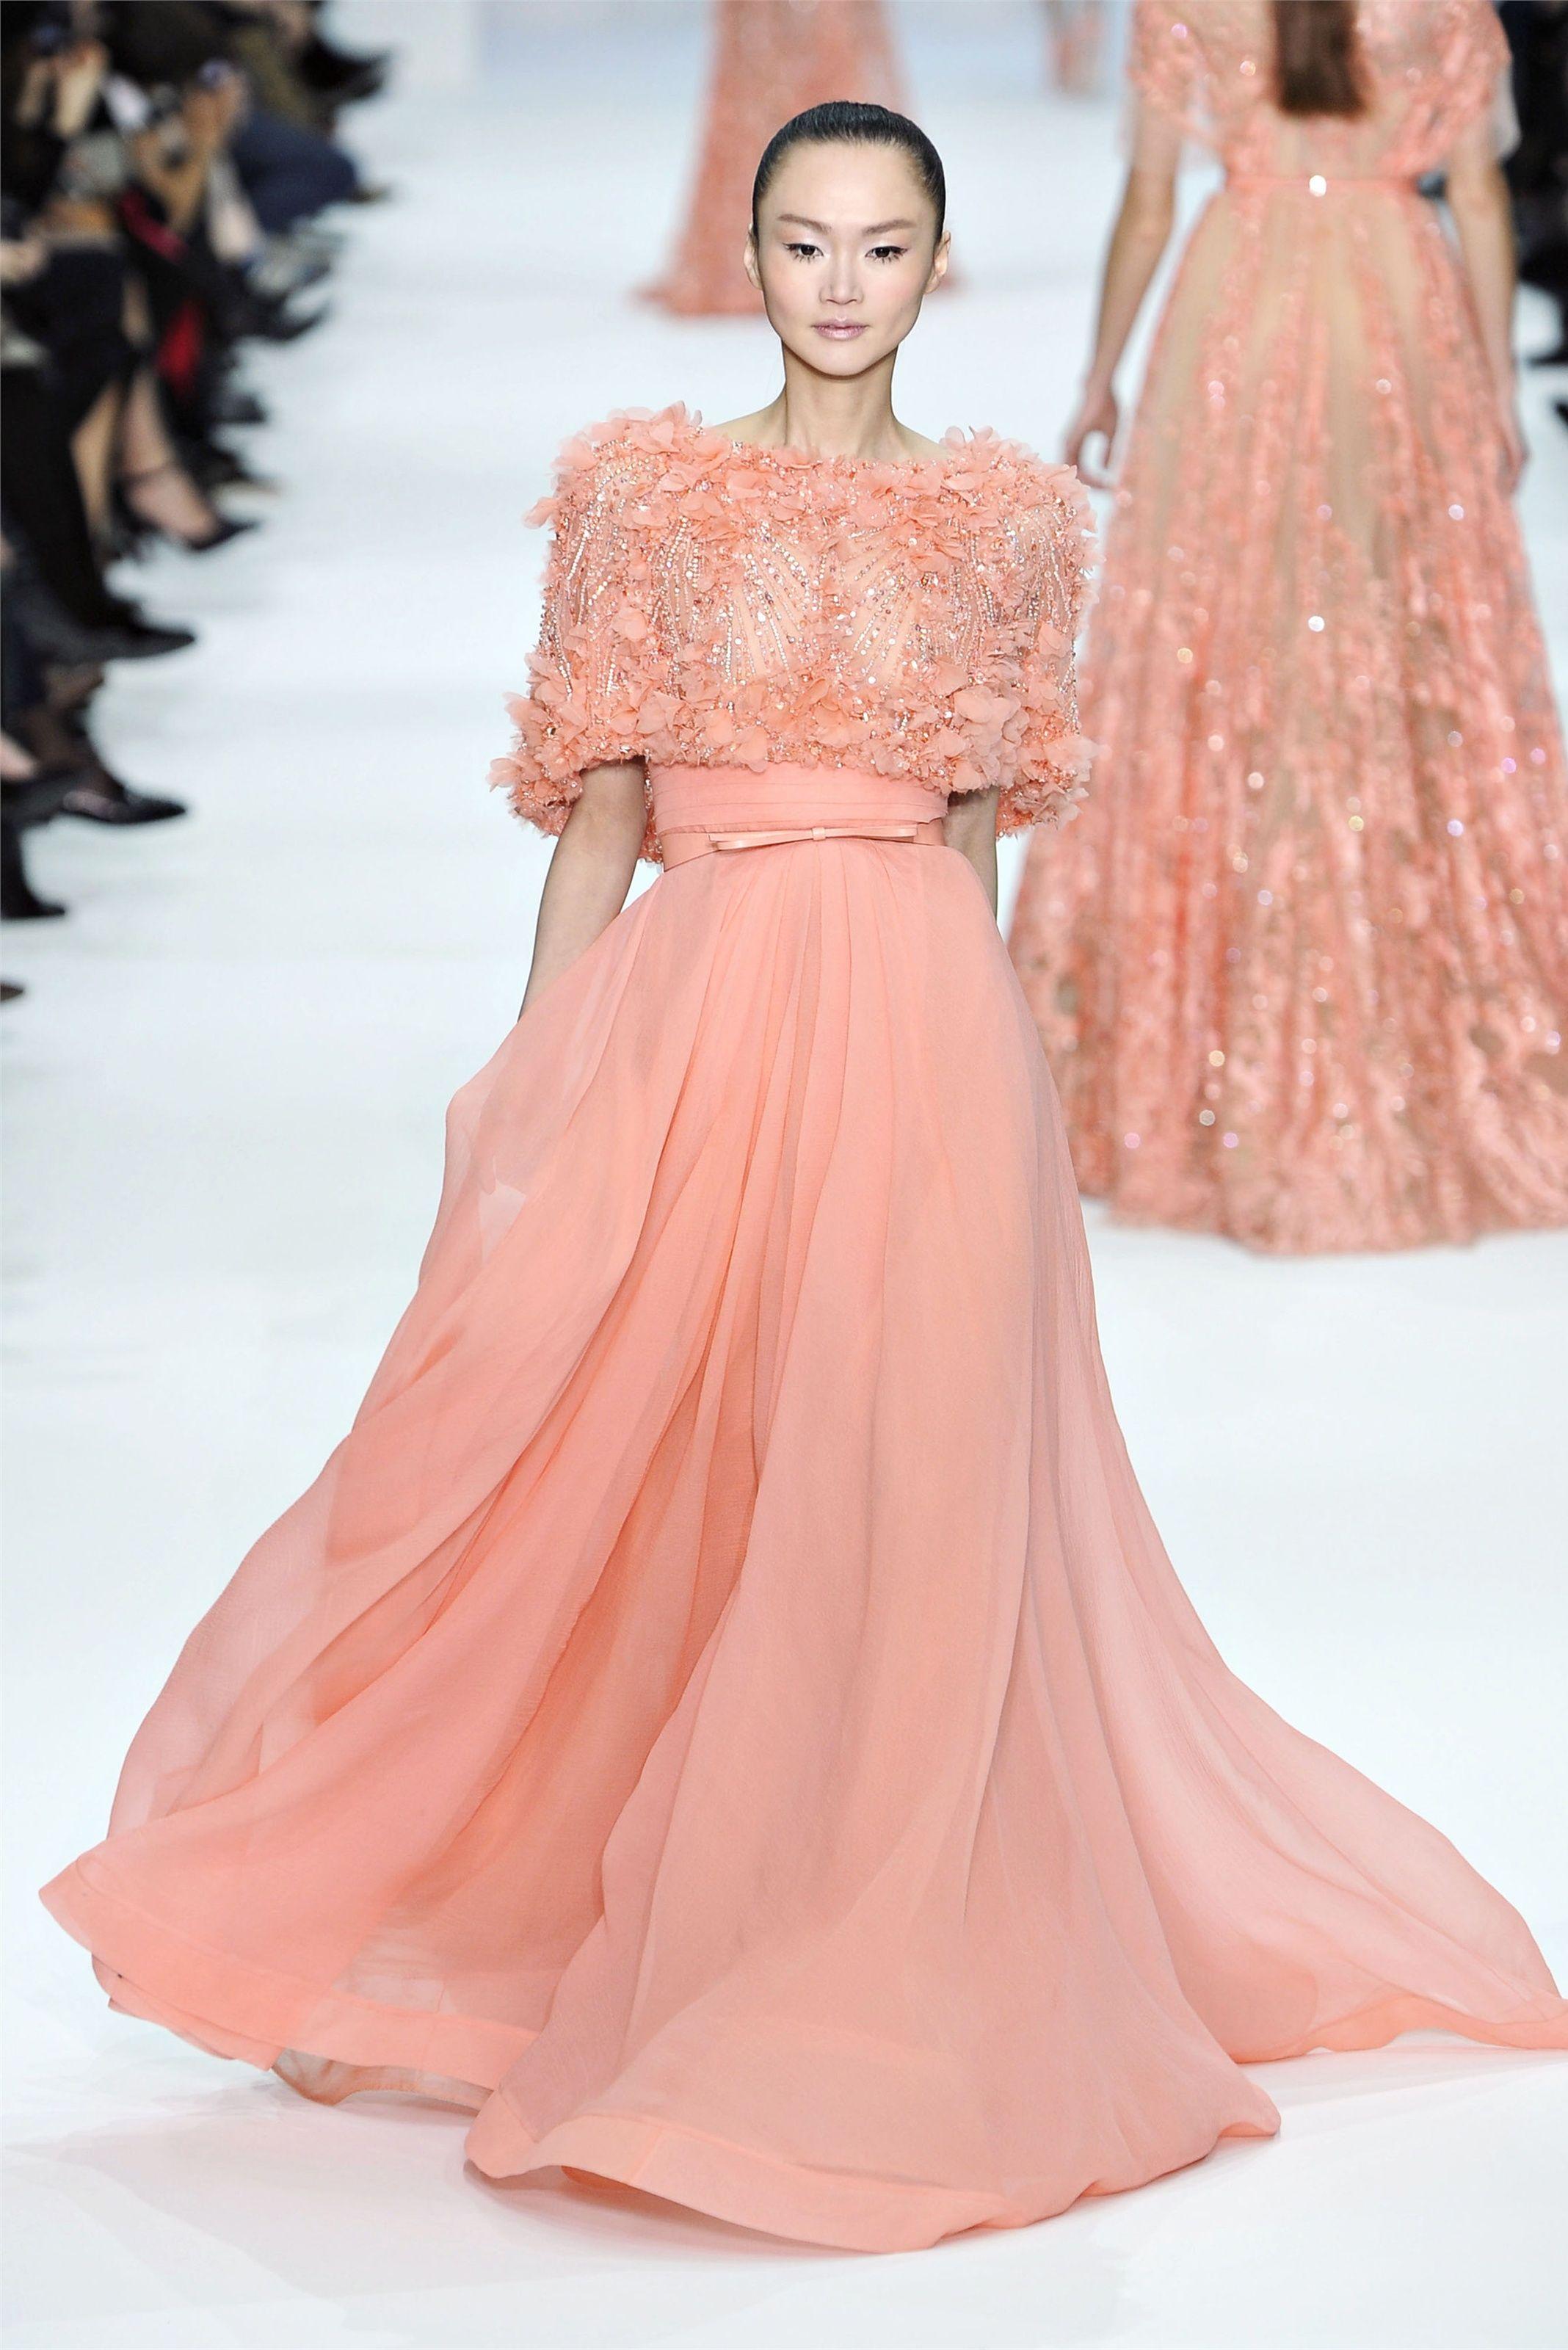 Elie Saab Haute Couture Spring Summer 2012. | V • E l i e S a a b by ...